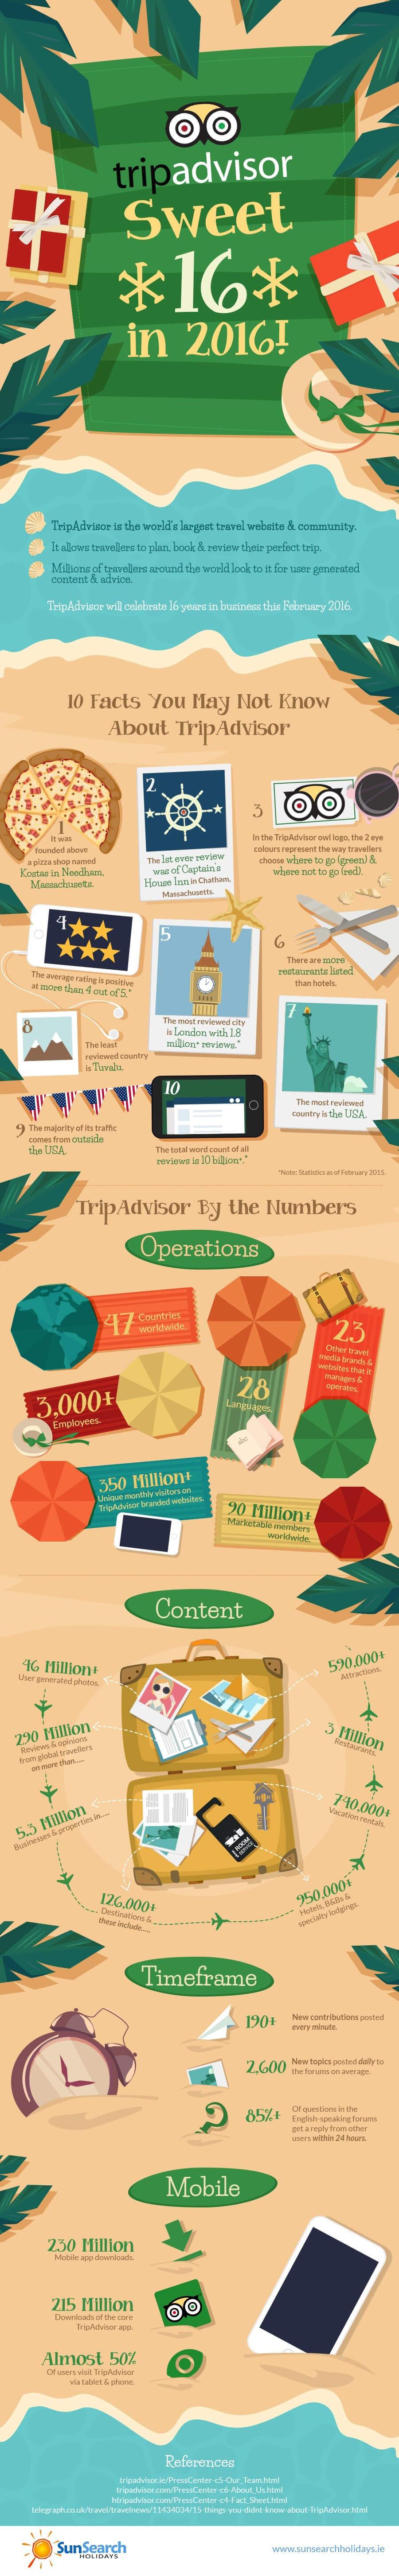 tripadvisor-sweet-16-in-2016-infographic